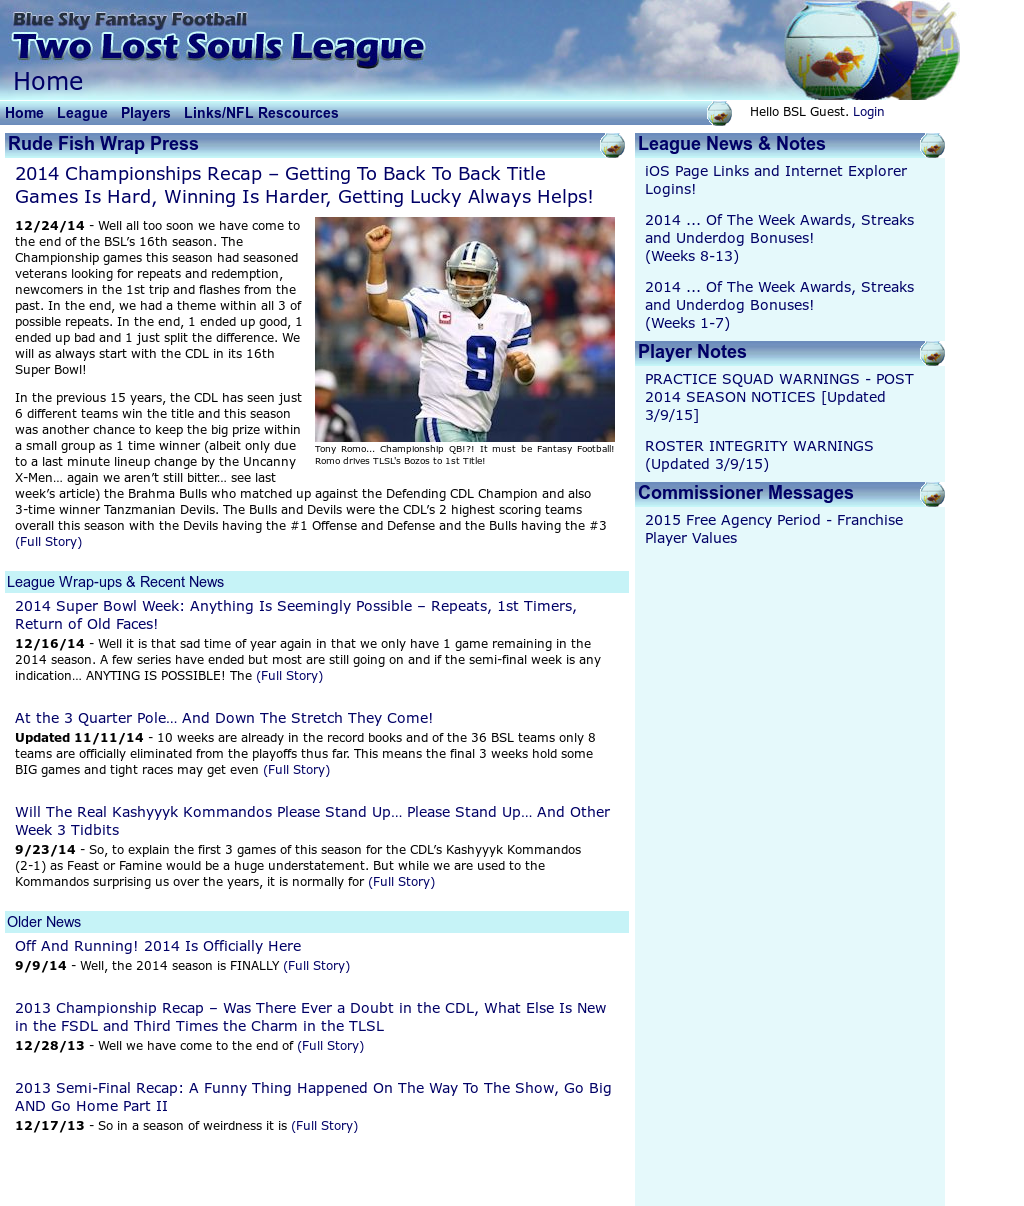 Blue Sky Fantasy Football Leagues Competitors, Revenue and